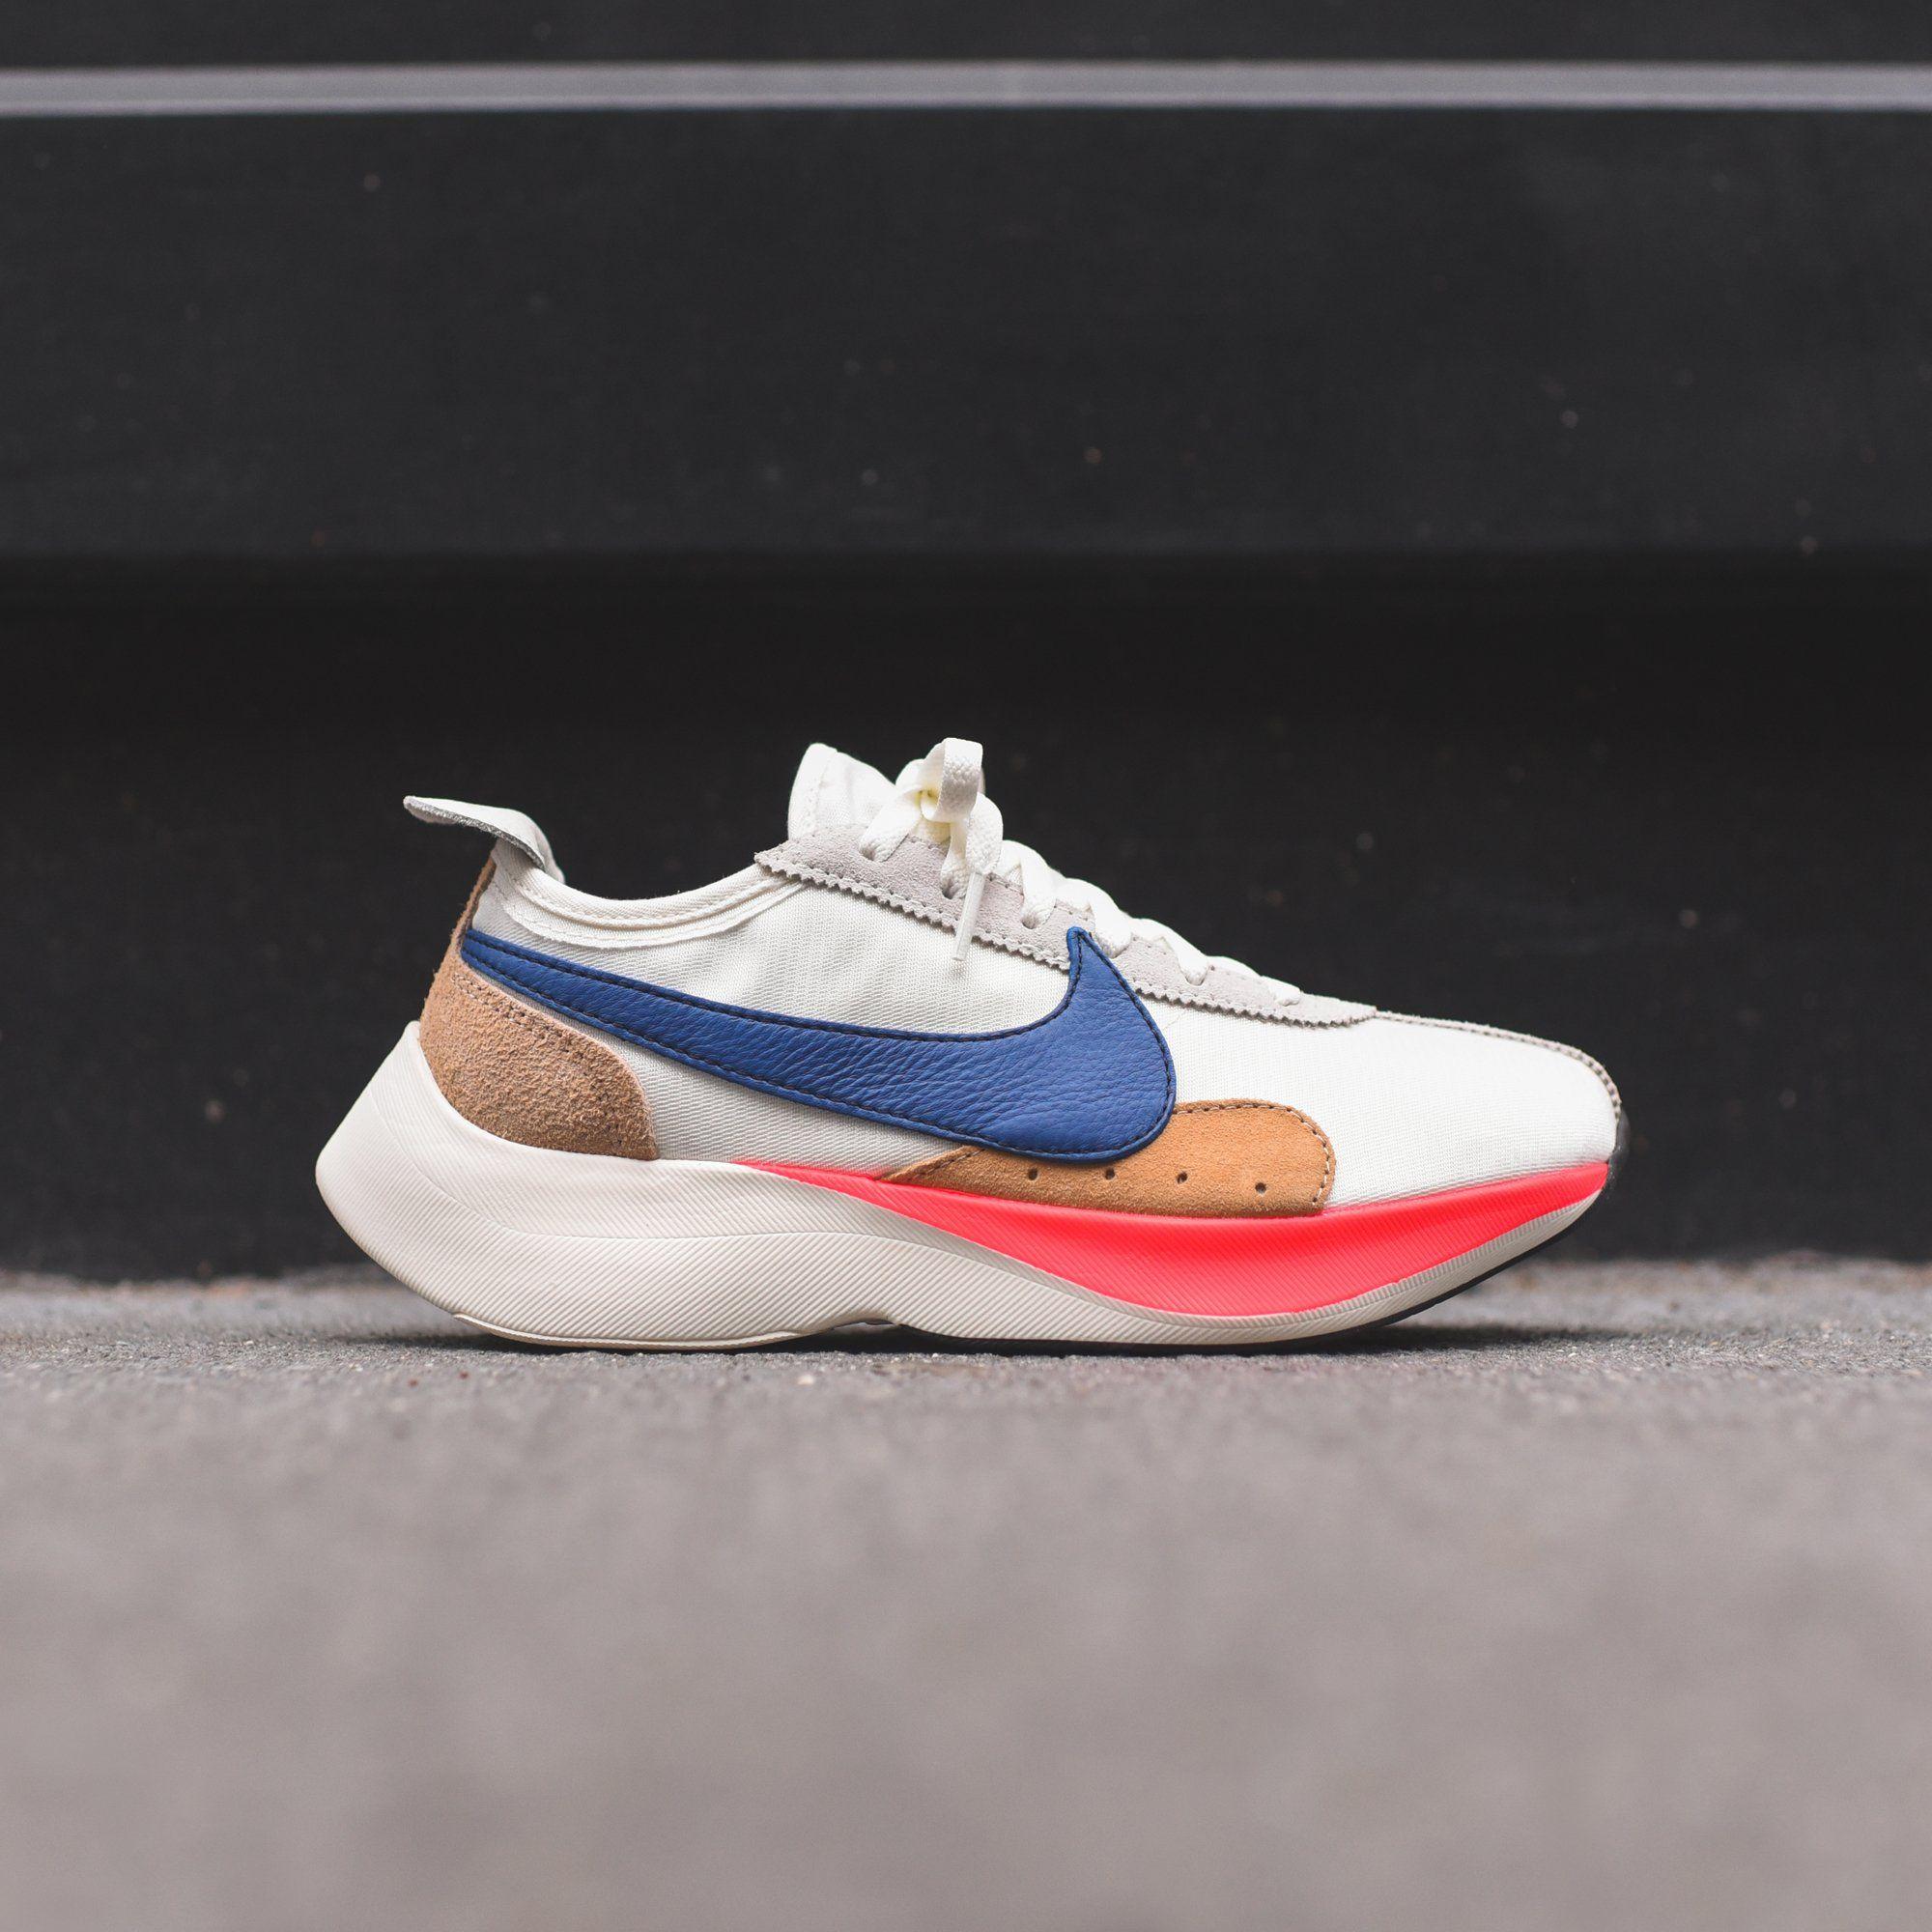 150 Nike Moon Racer Qs Sail Gym Blue Solar Red Praline Nike Suede Heels Desert Boots